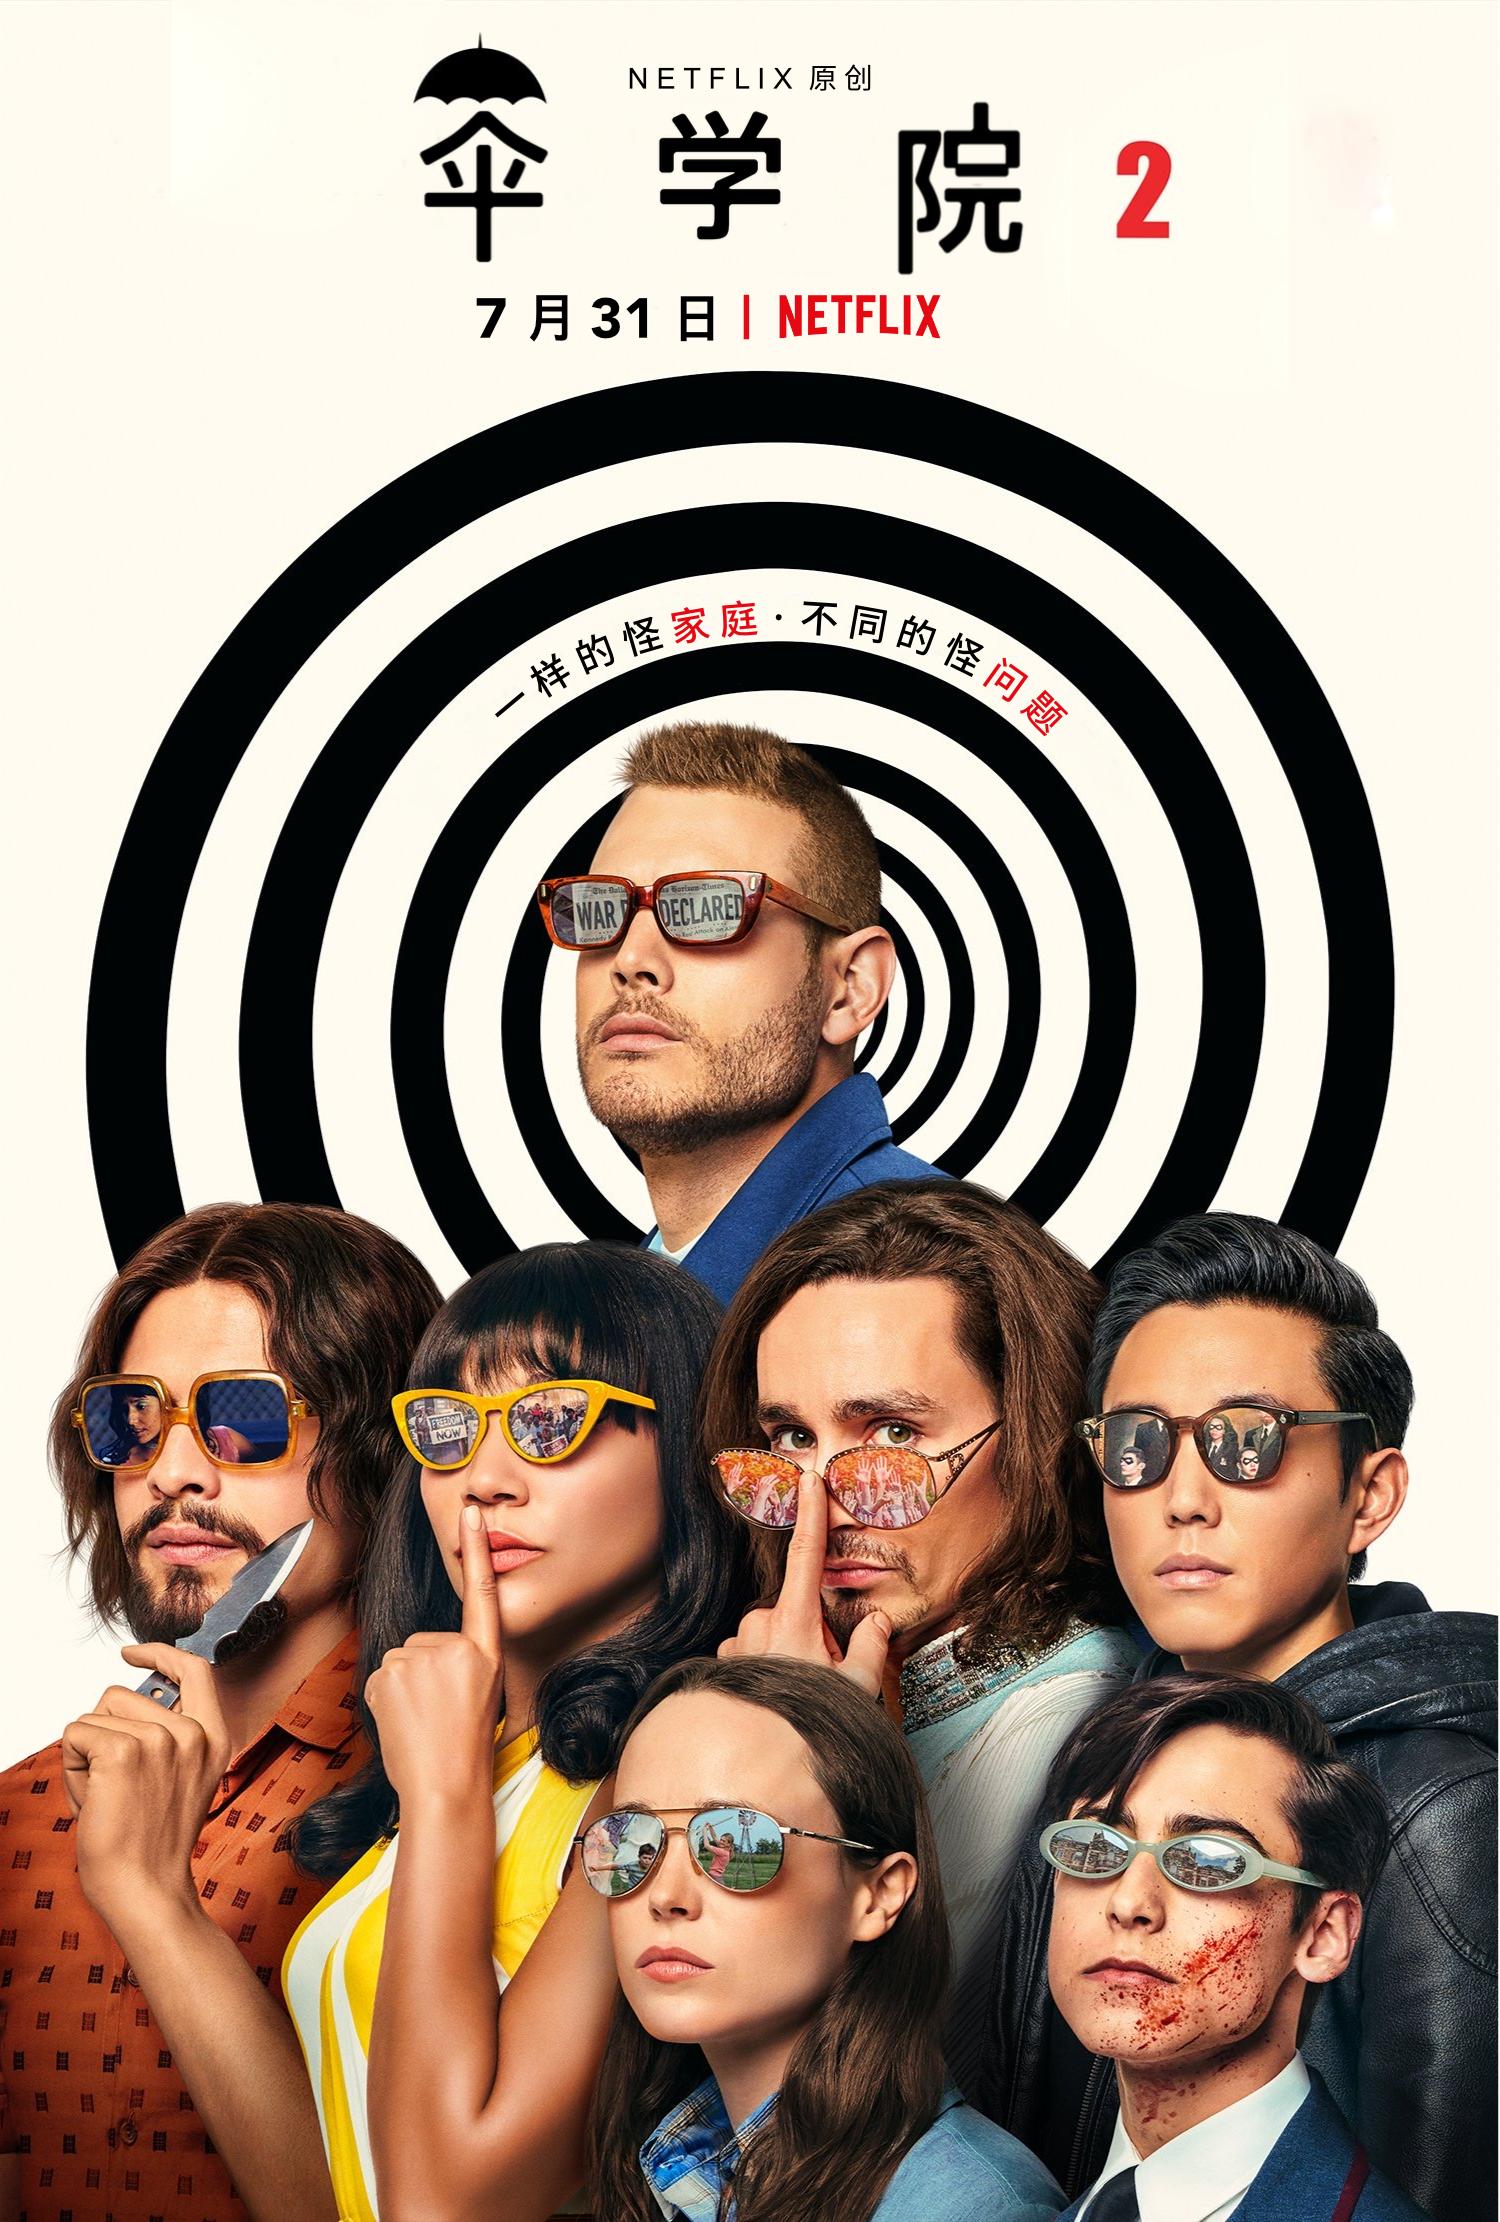 Netflix 2020 年最多人观看剧集TOP10,剧迷们赶快追起来吧!插图6